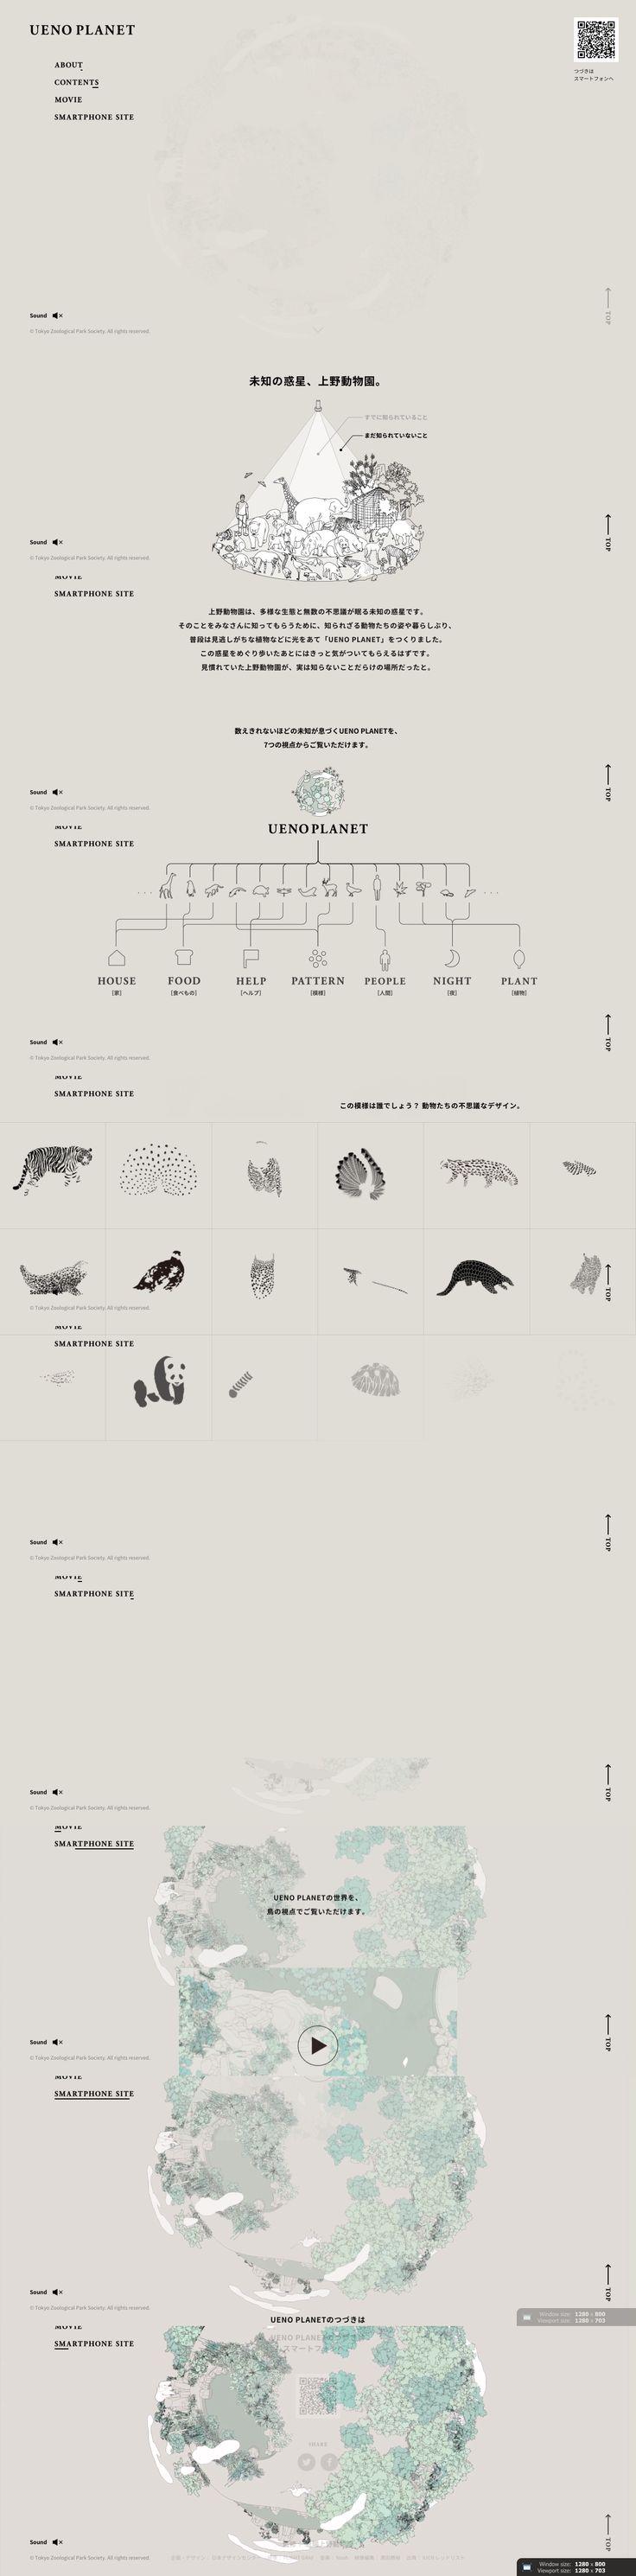 http://www.tokyo-zoo.net/zoo/ueno/planet/pc/